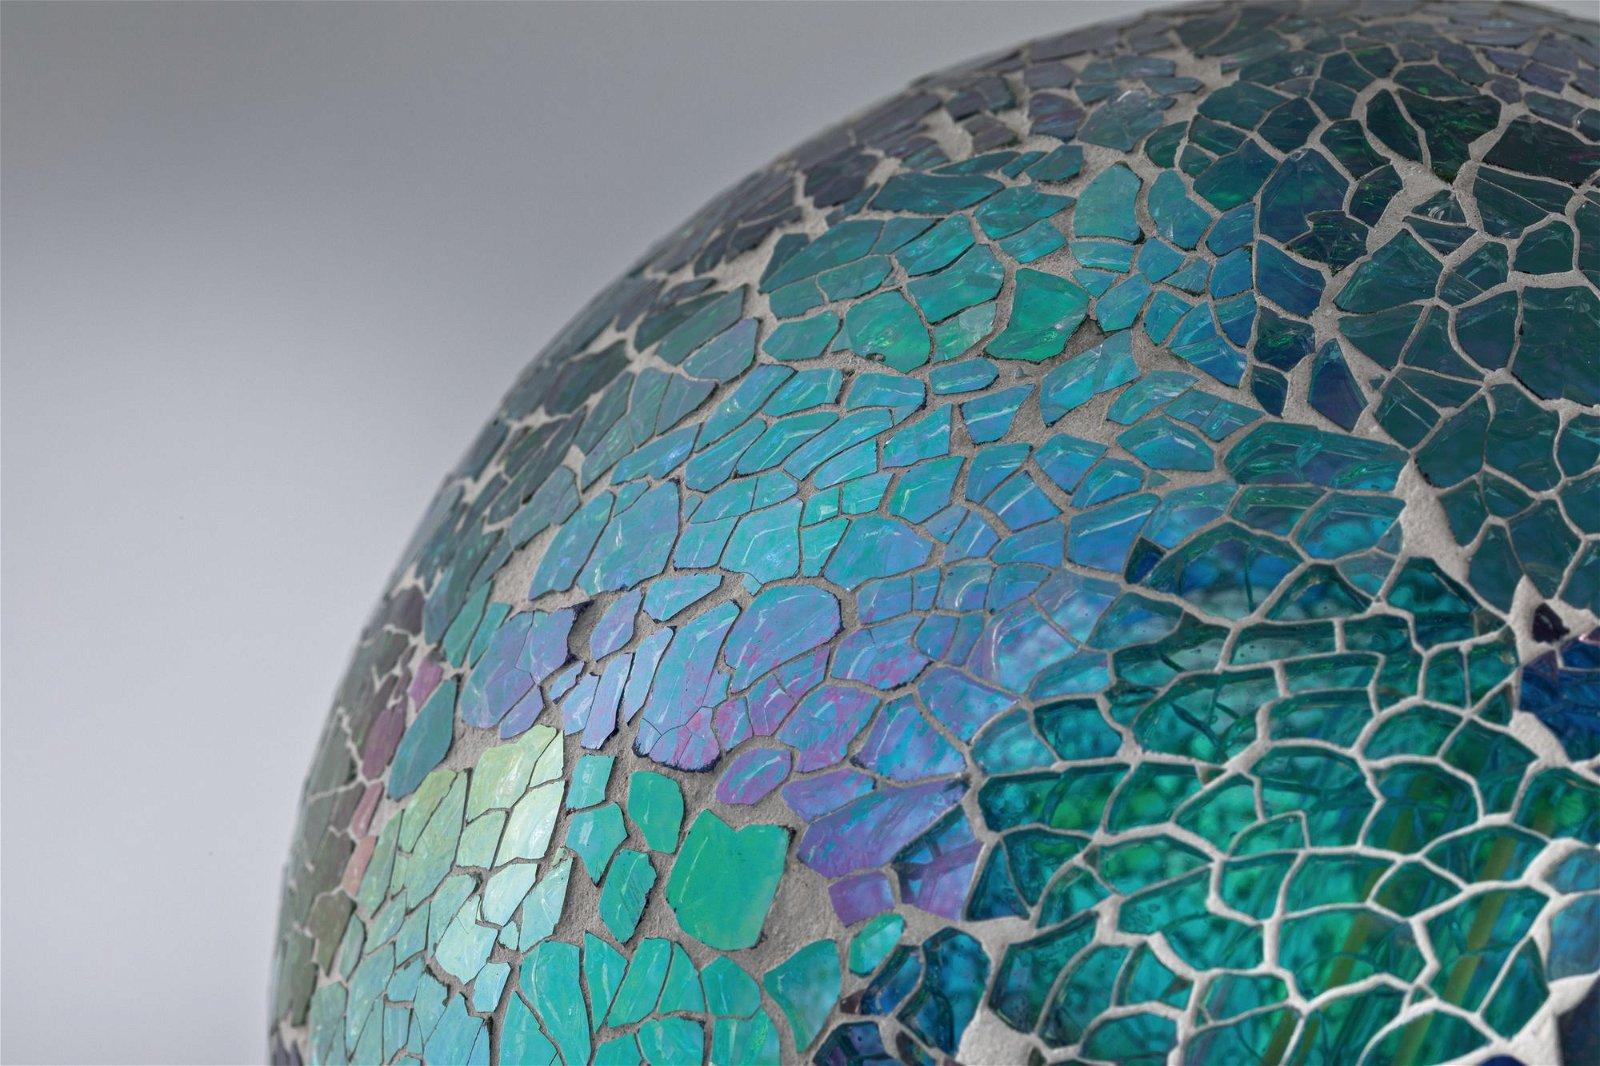 Miracle Mosaic Edition LED Globe E27 230V 470lm 5W 2700K Multicolor